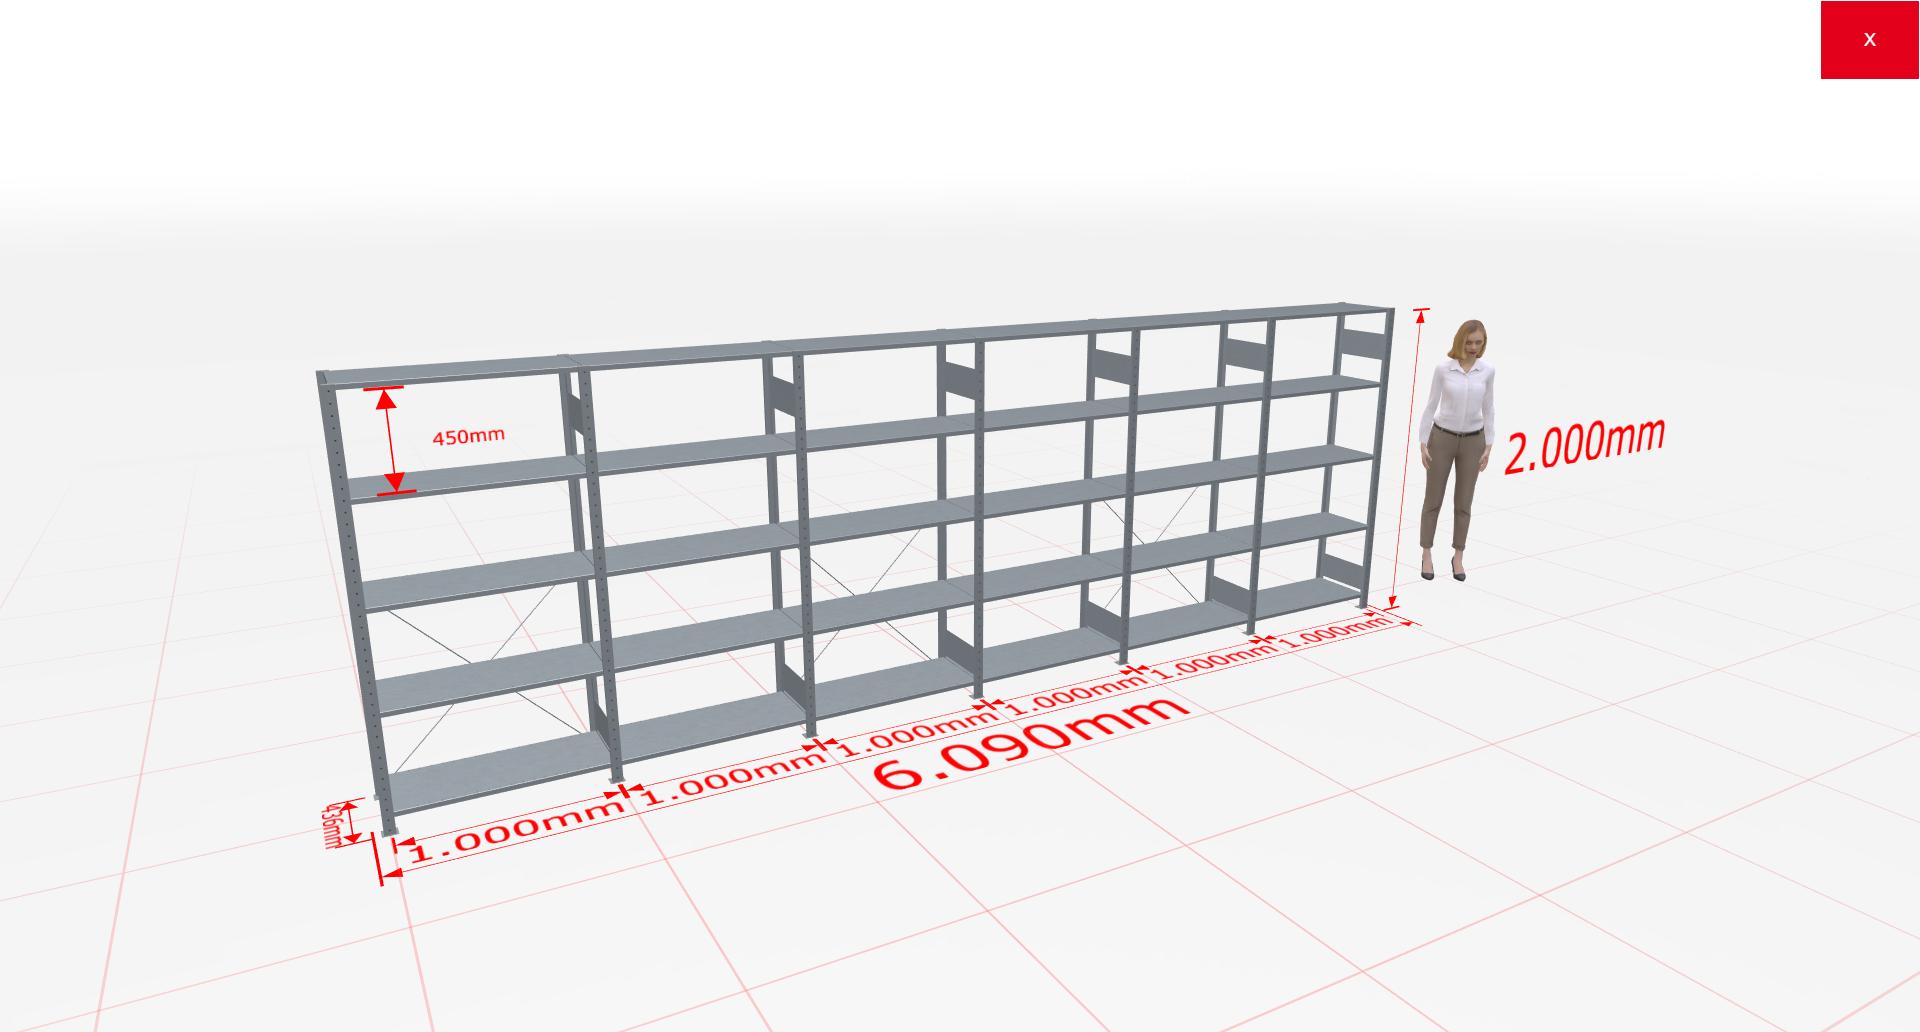 Fachbodenregal Komplettregal 2000x6090x400 mm (HxBxT) SCHULTE Lagertechnik verzinkt 5 Ebenen  150 kg je Boden